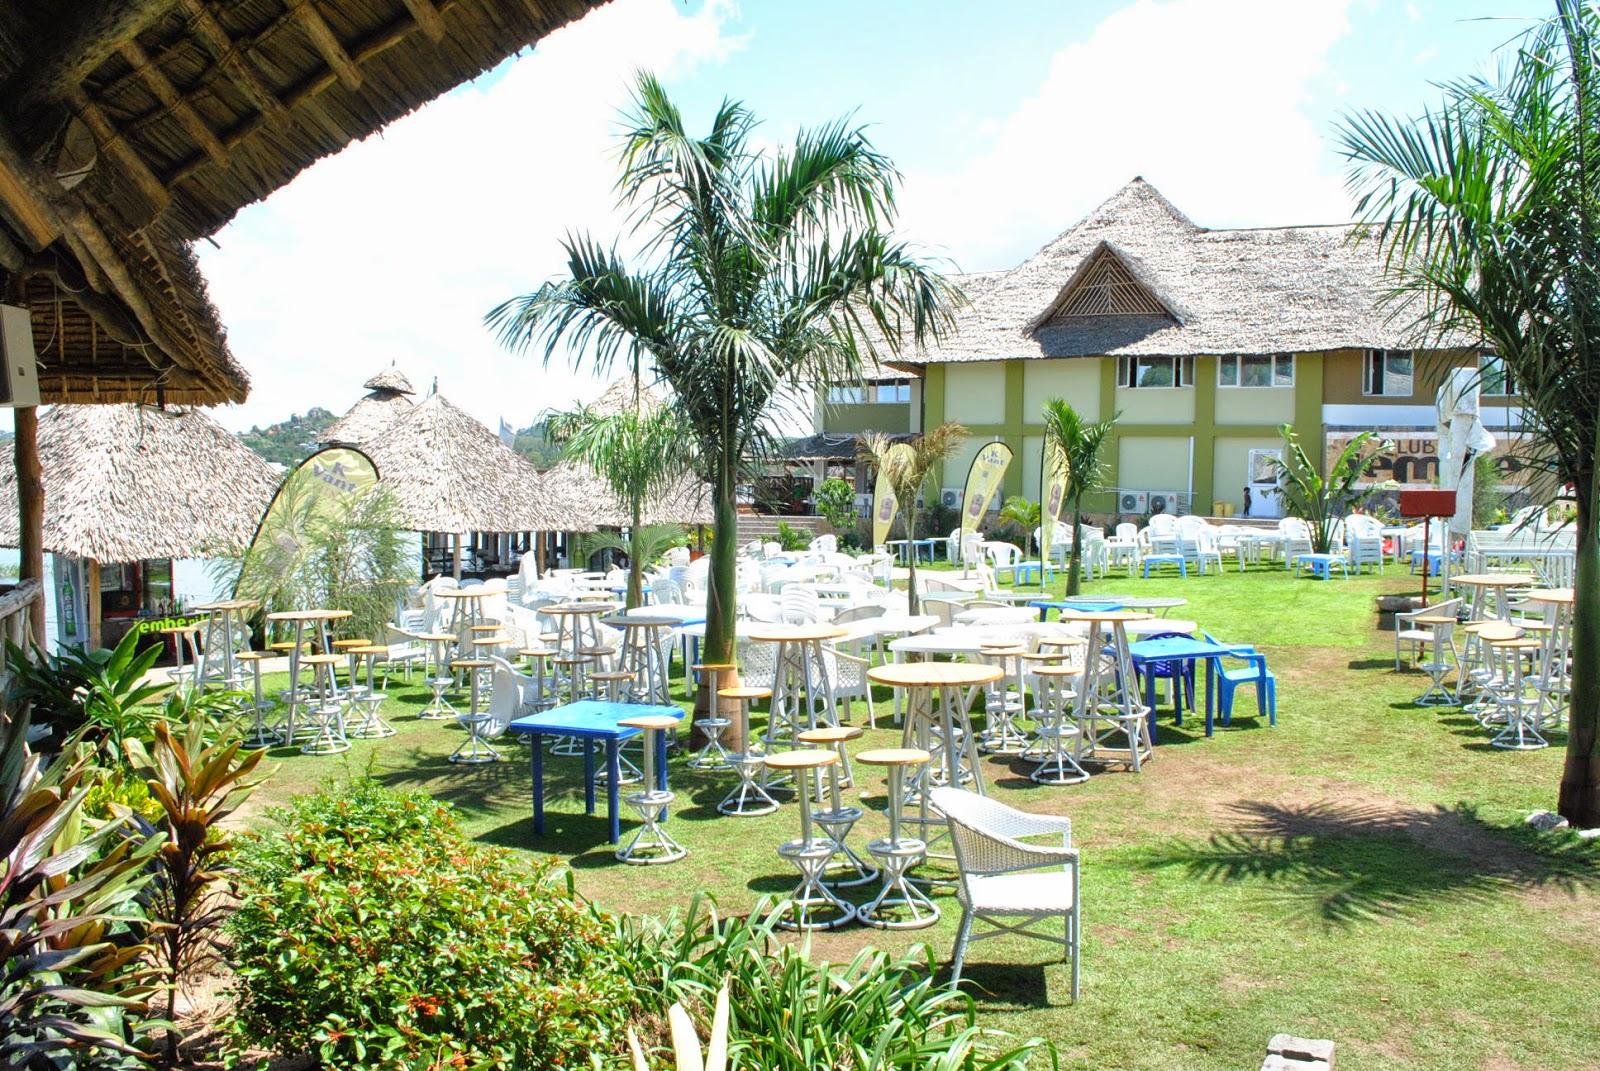 jembe ni Jembe beach Mwanza